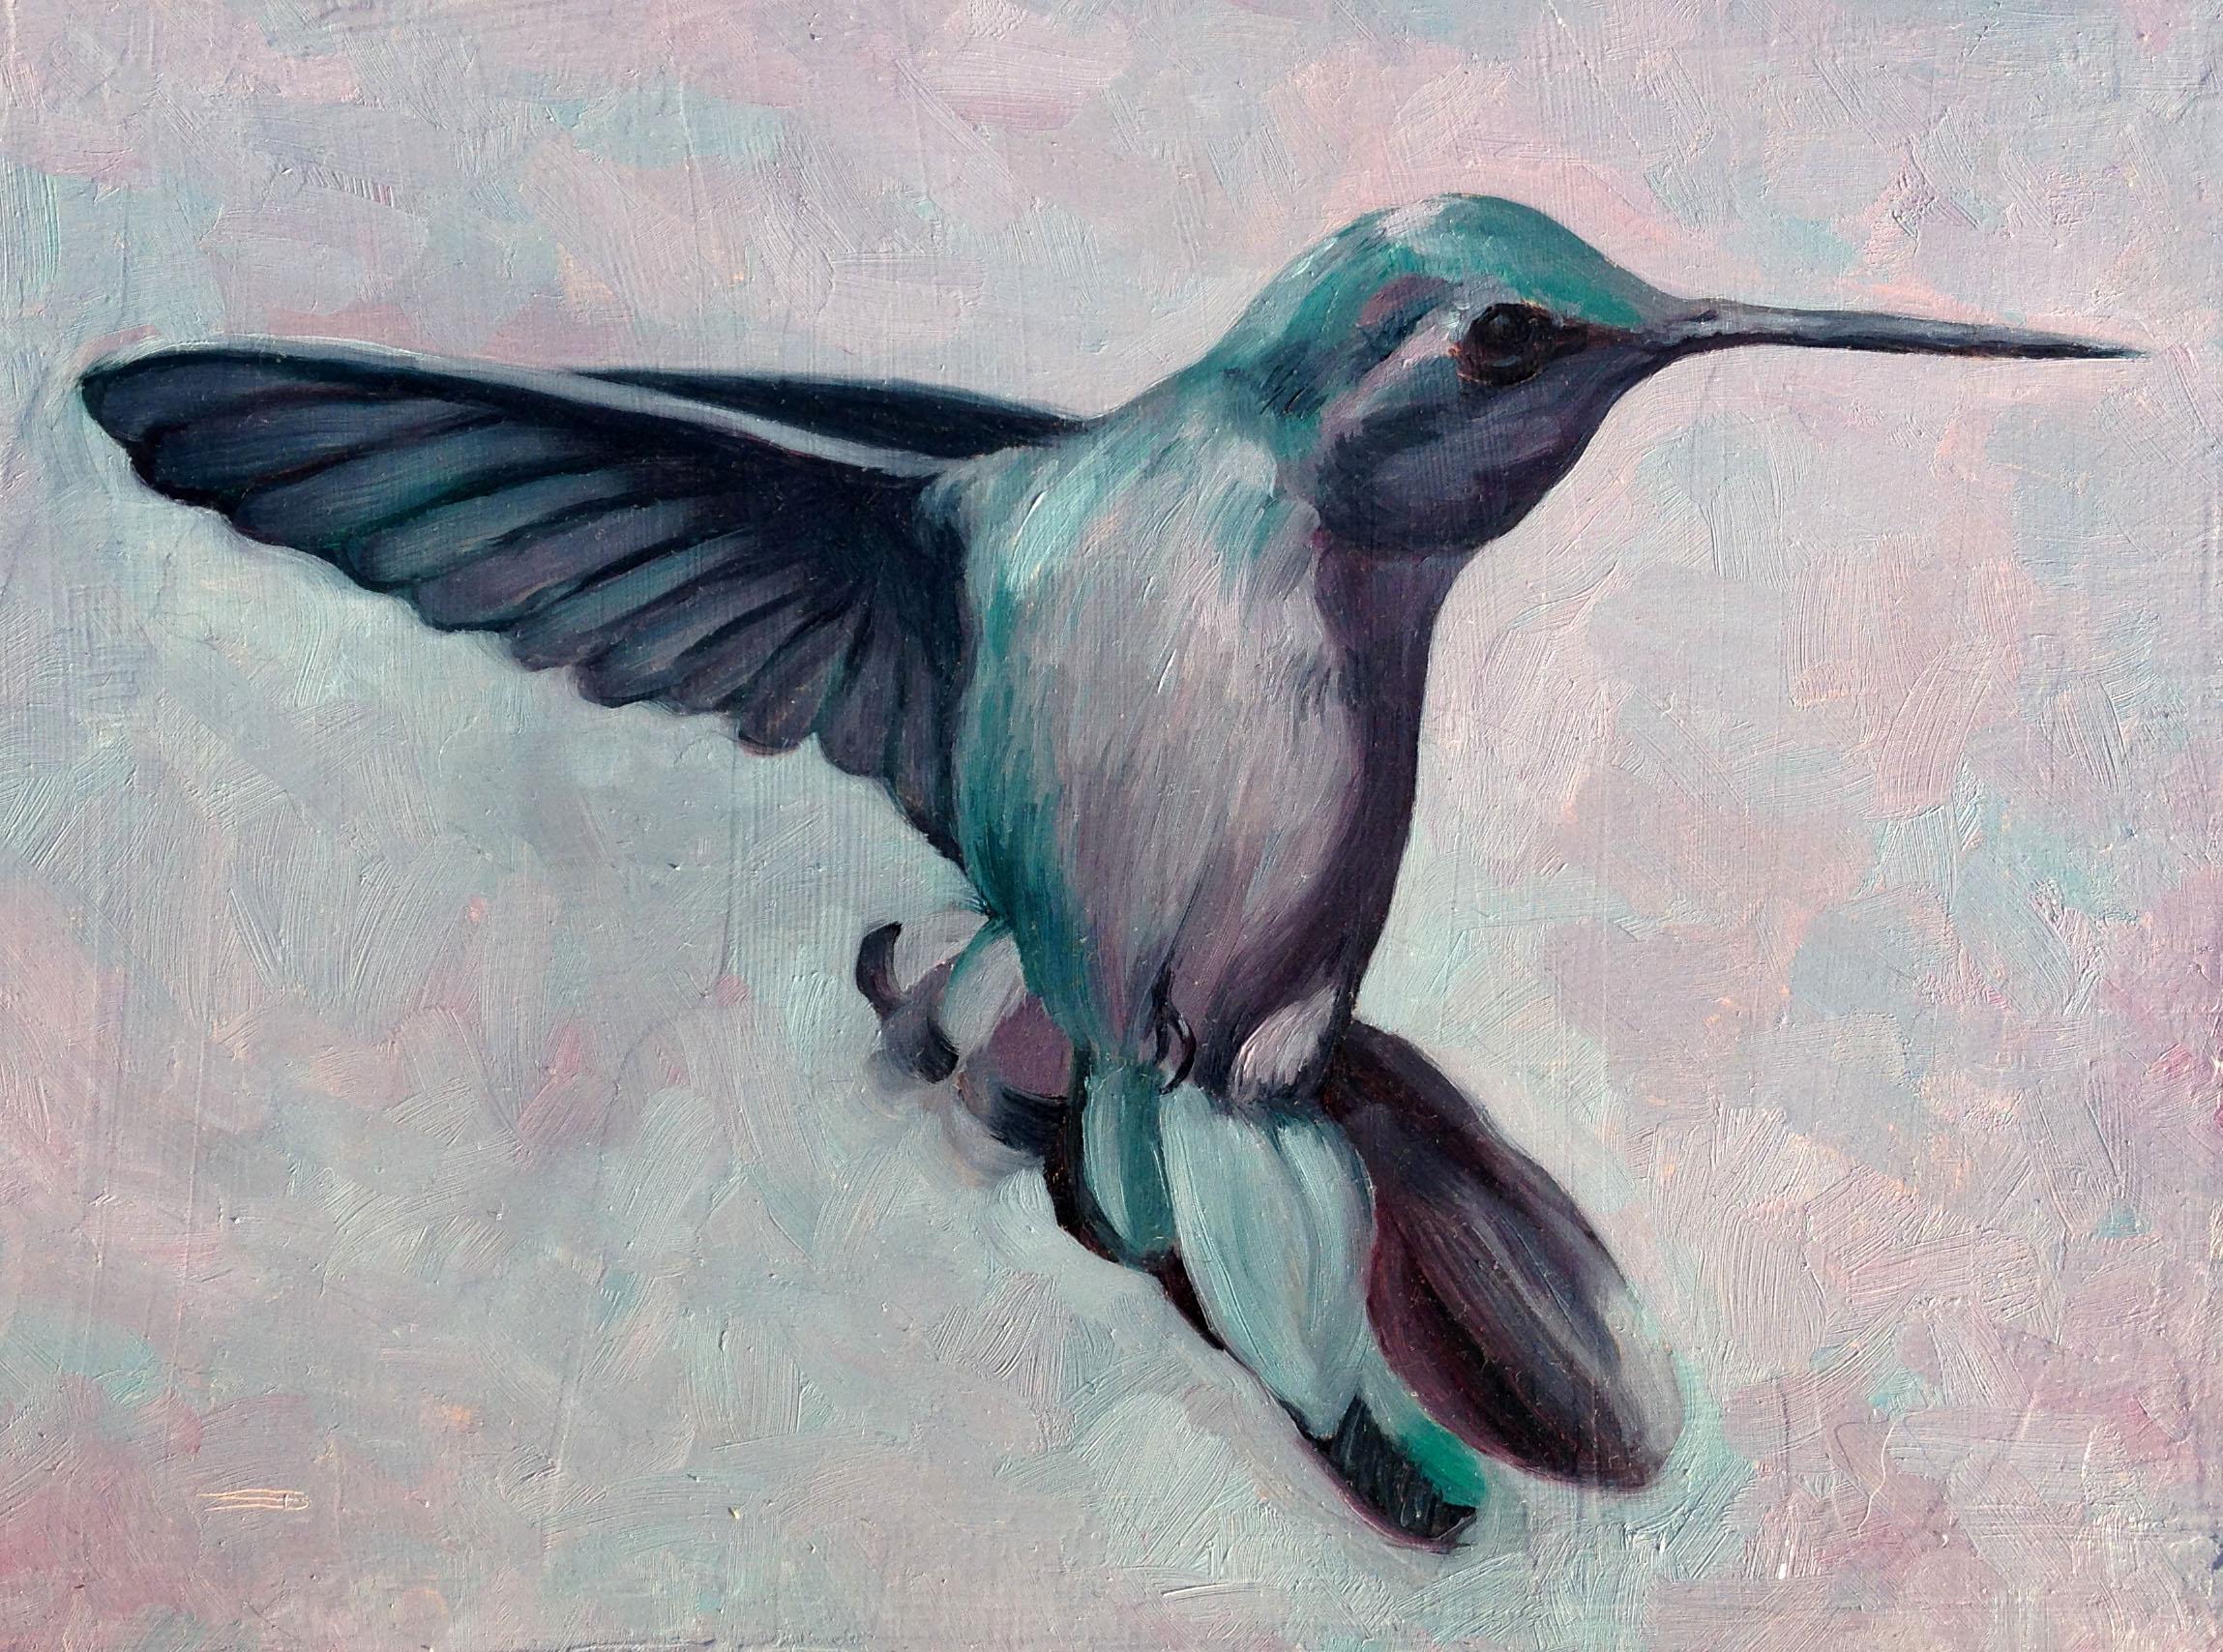 bryan_tipton_hummingbird.jpg